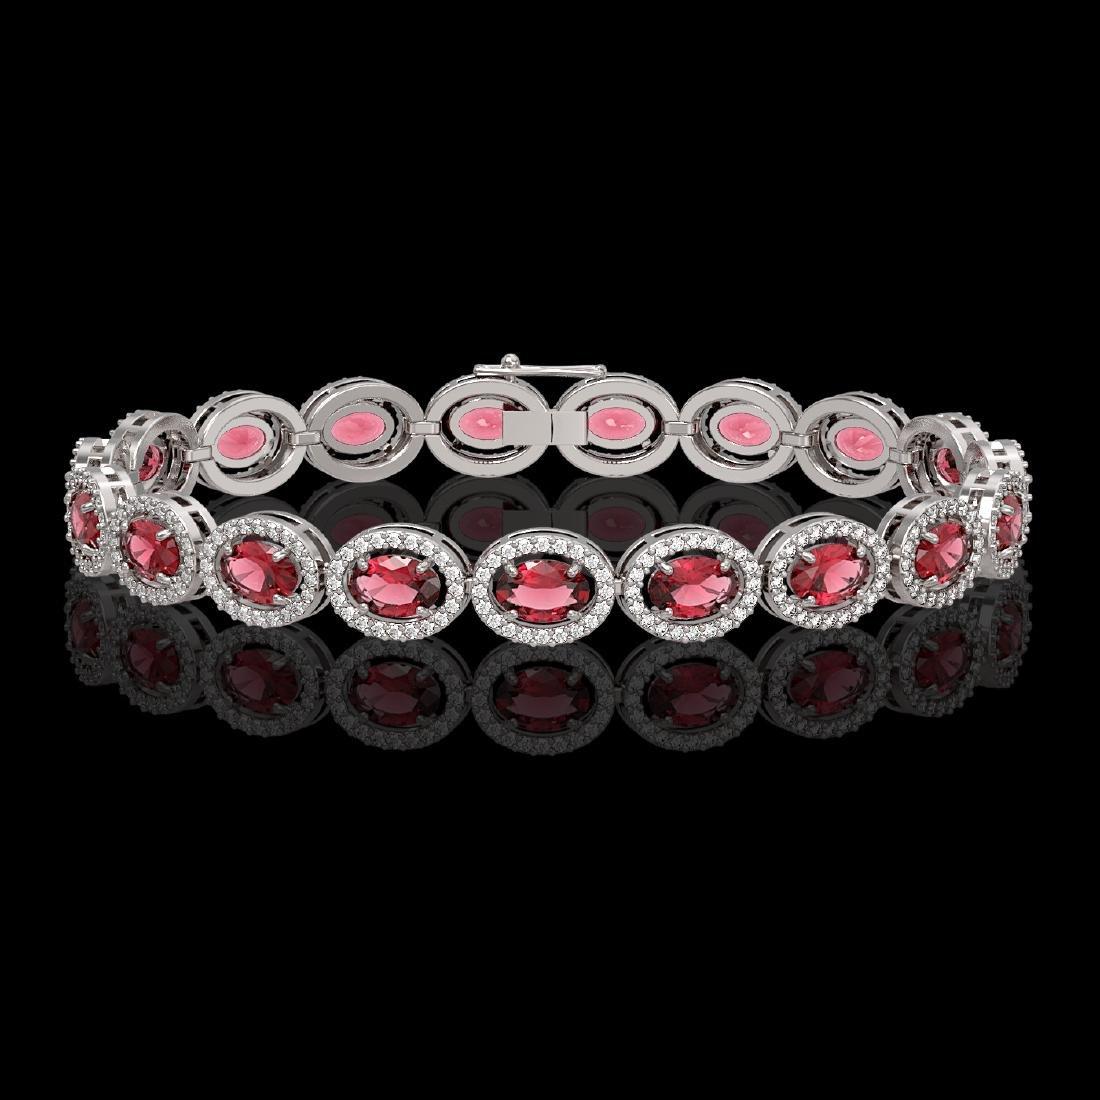 13.87 CTW Tourmaline & Diamond Halo Bracelet 10K White